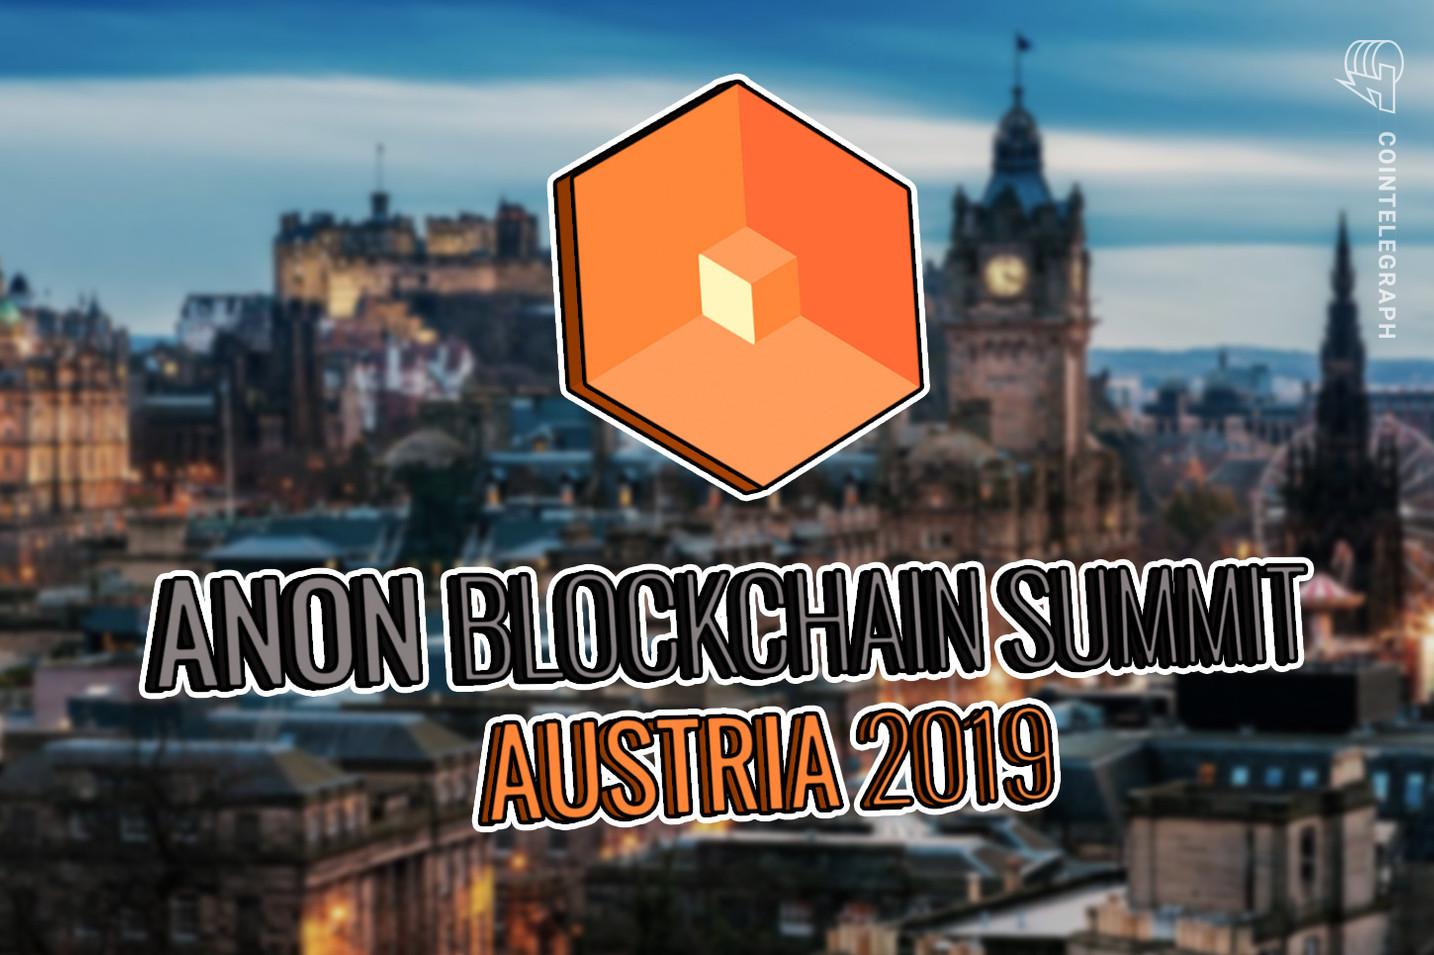 Austria's Premium Blockchain Summit Attracts Billion-Dollar Businesses to Line Up Ahead of Launch